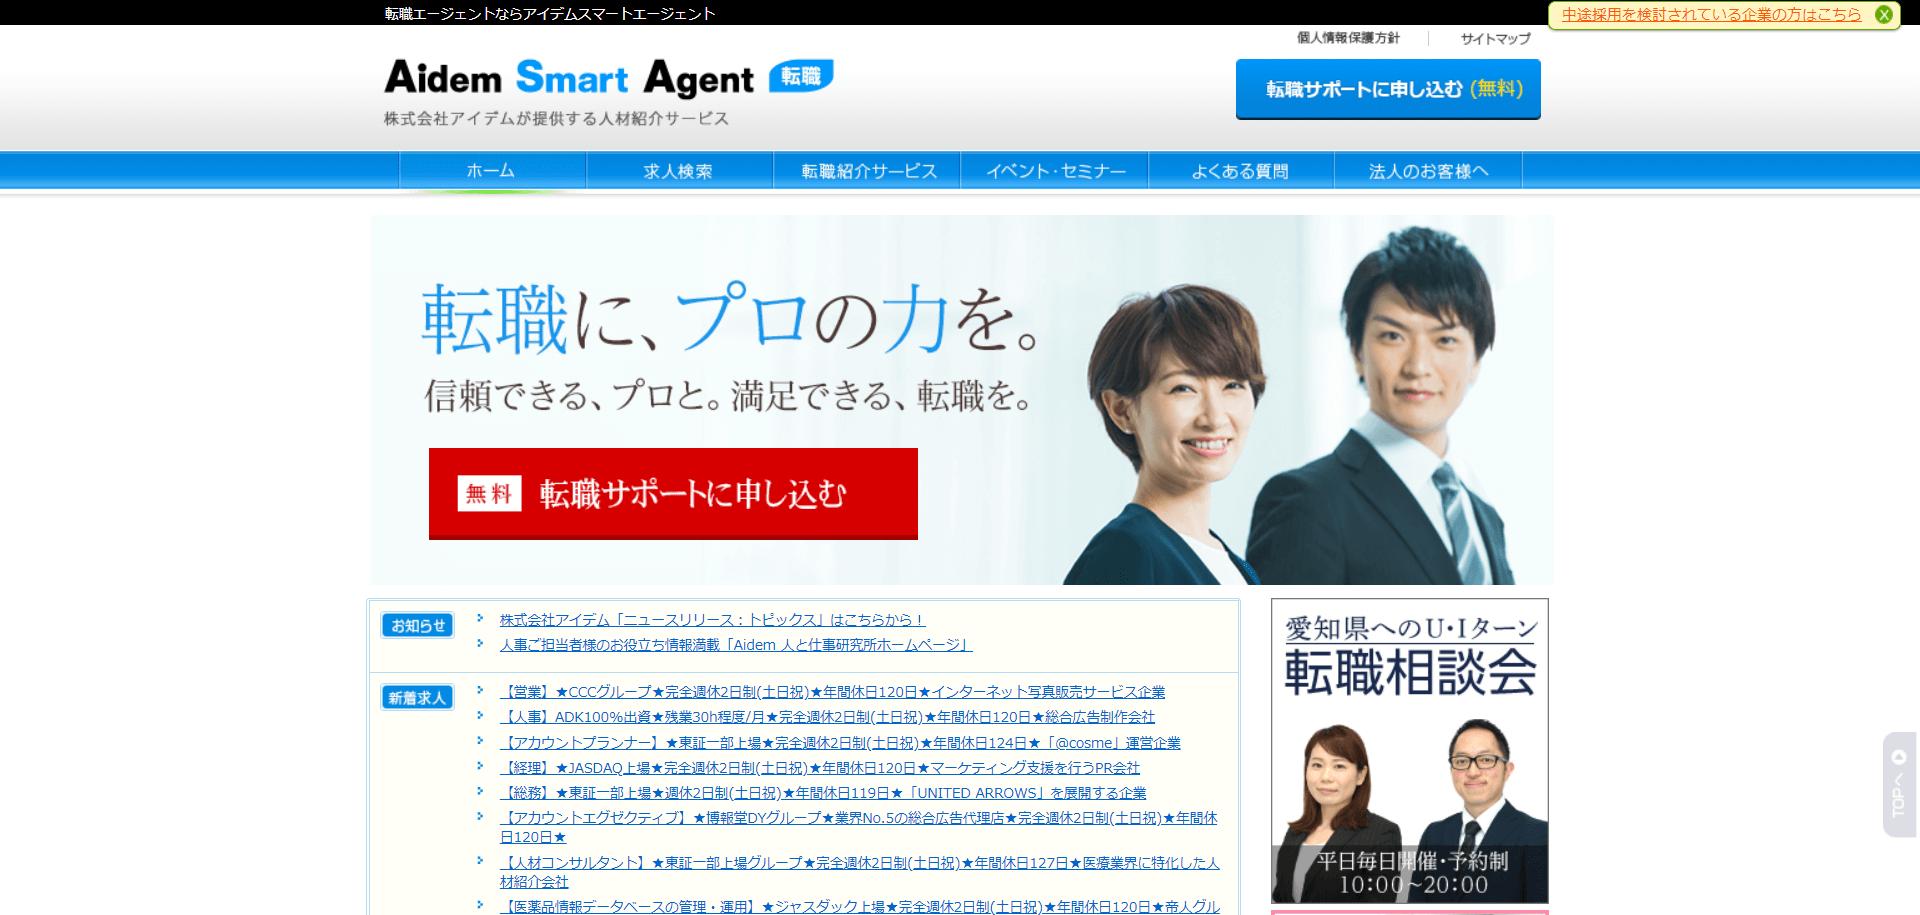 Aidem Smart Agent